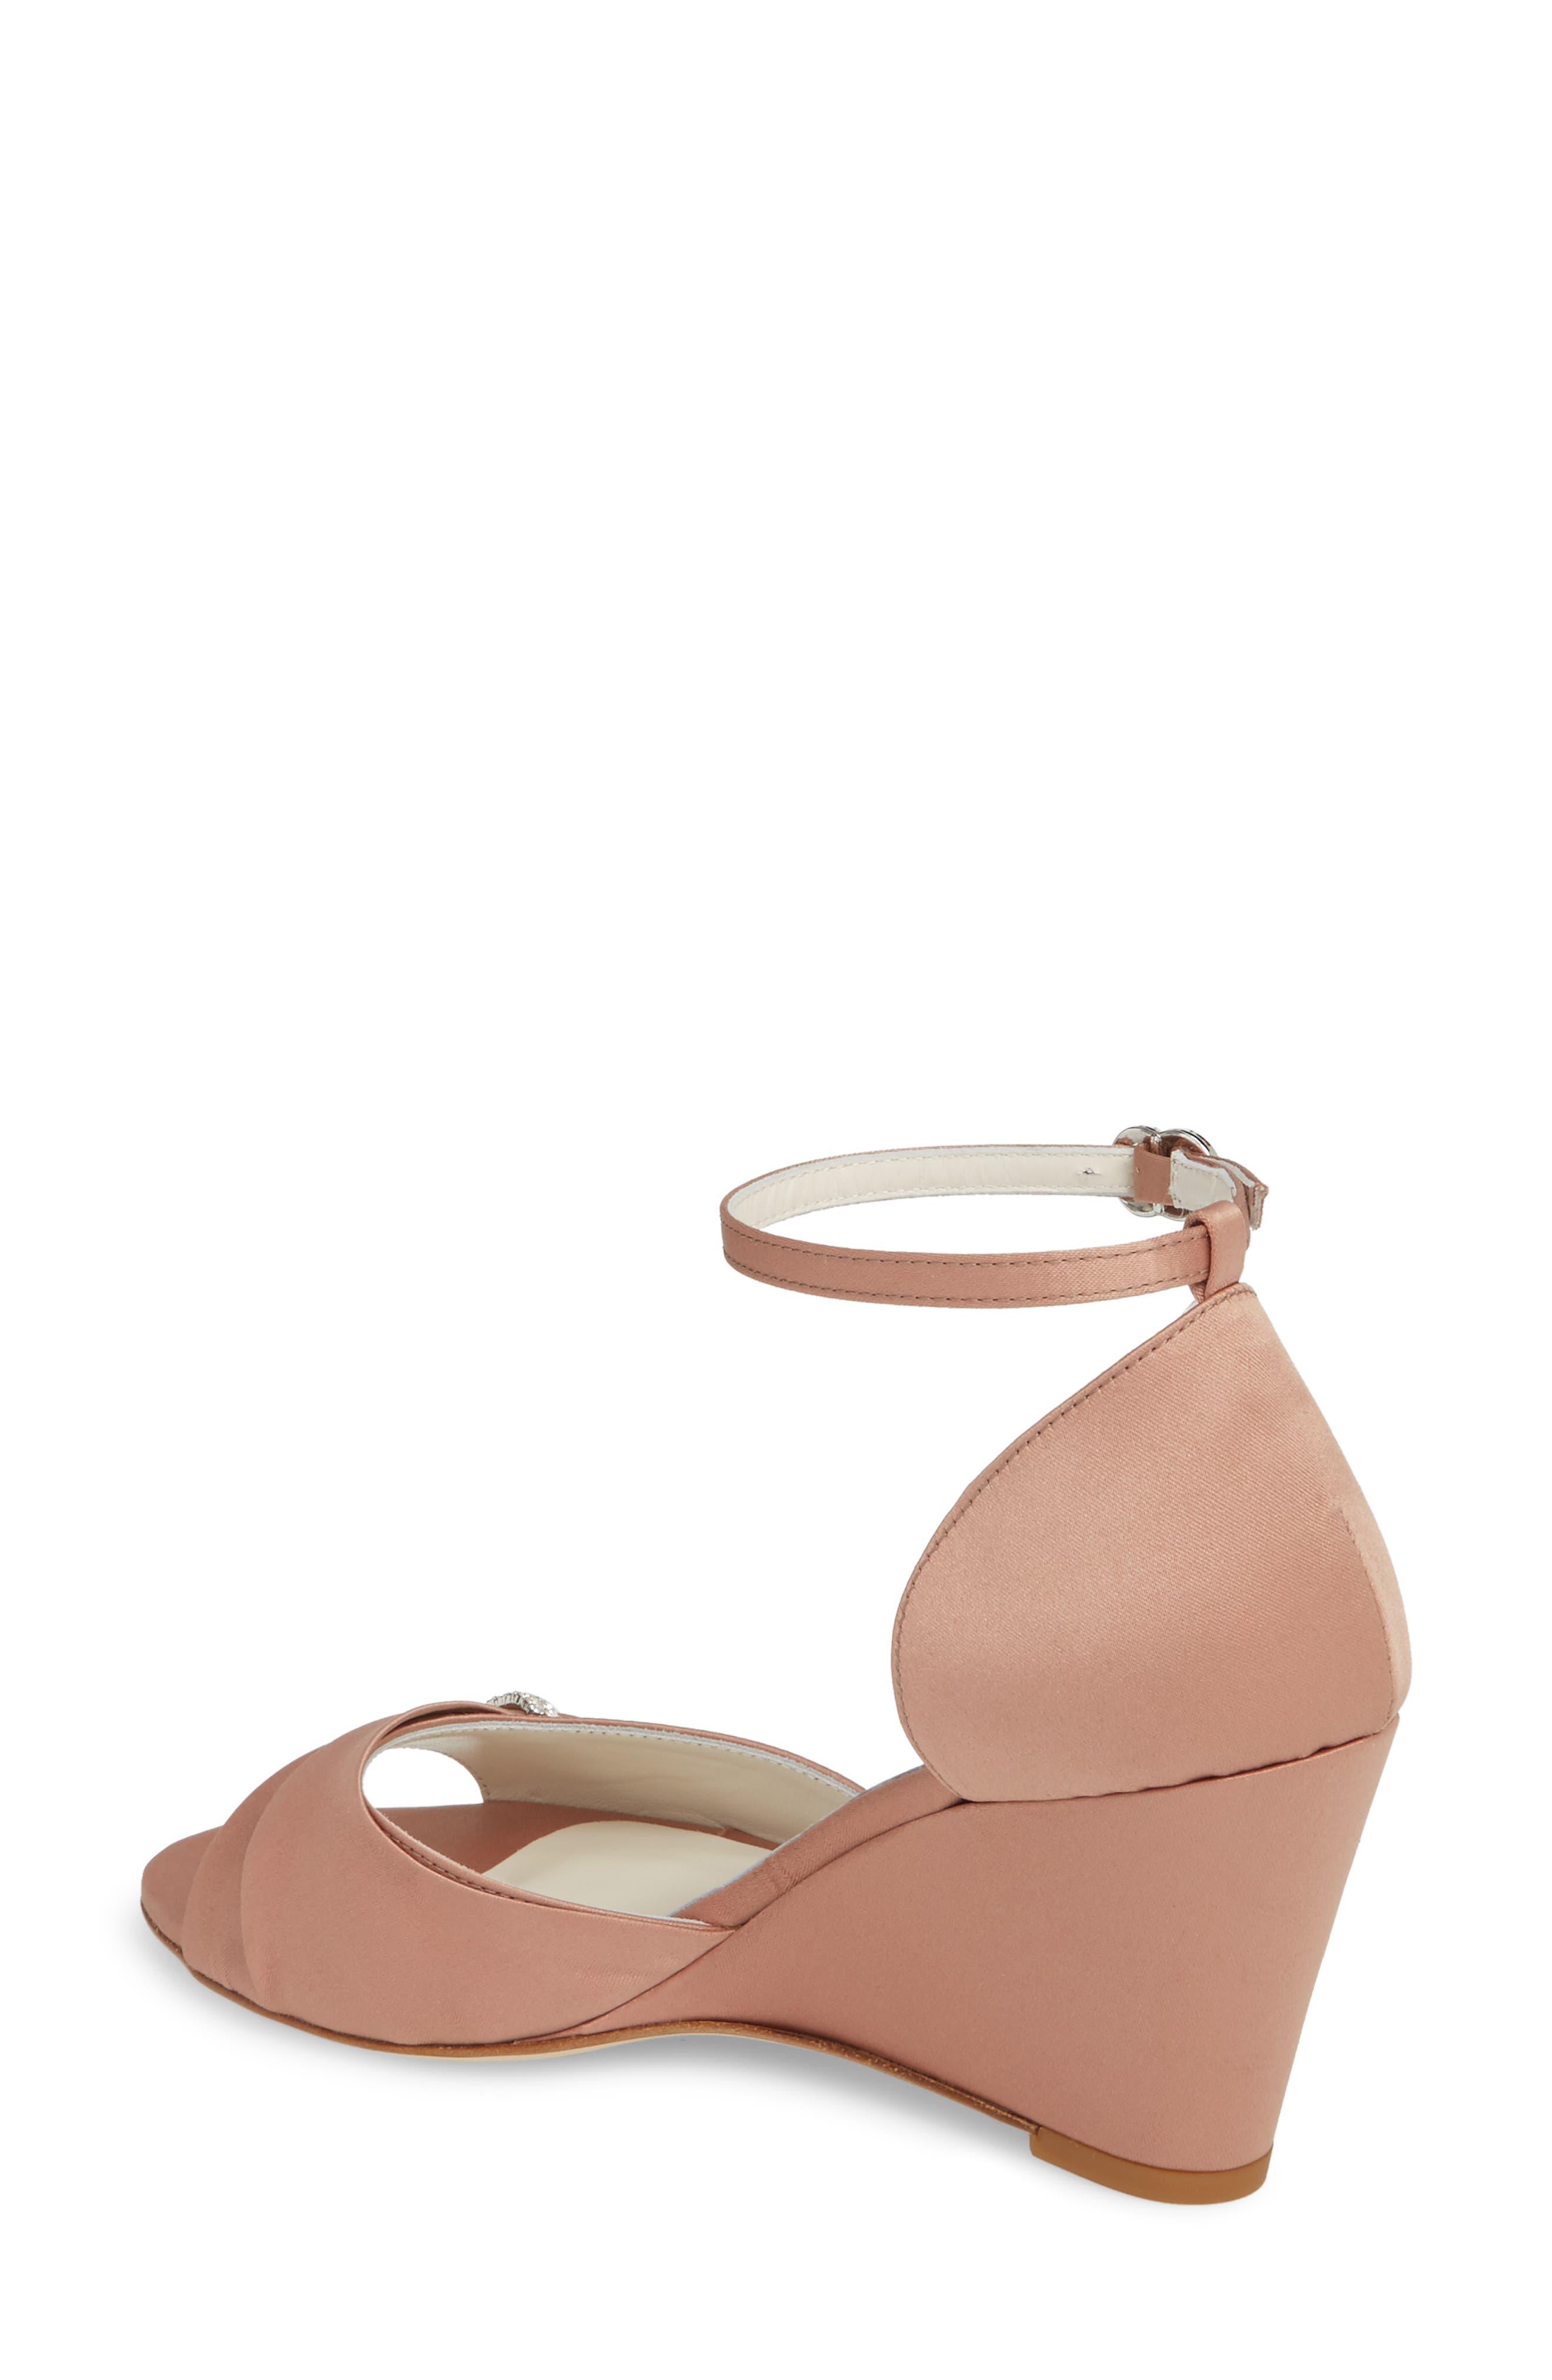 Queenie Ankle Strap Wedge Sandal,                             Alternate thumbnail 2, color,                             Blush Satin